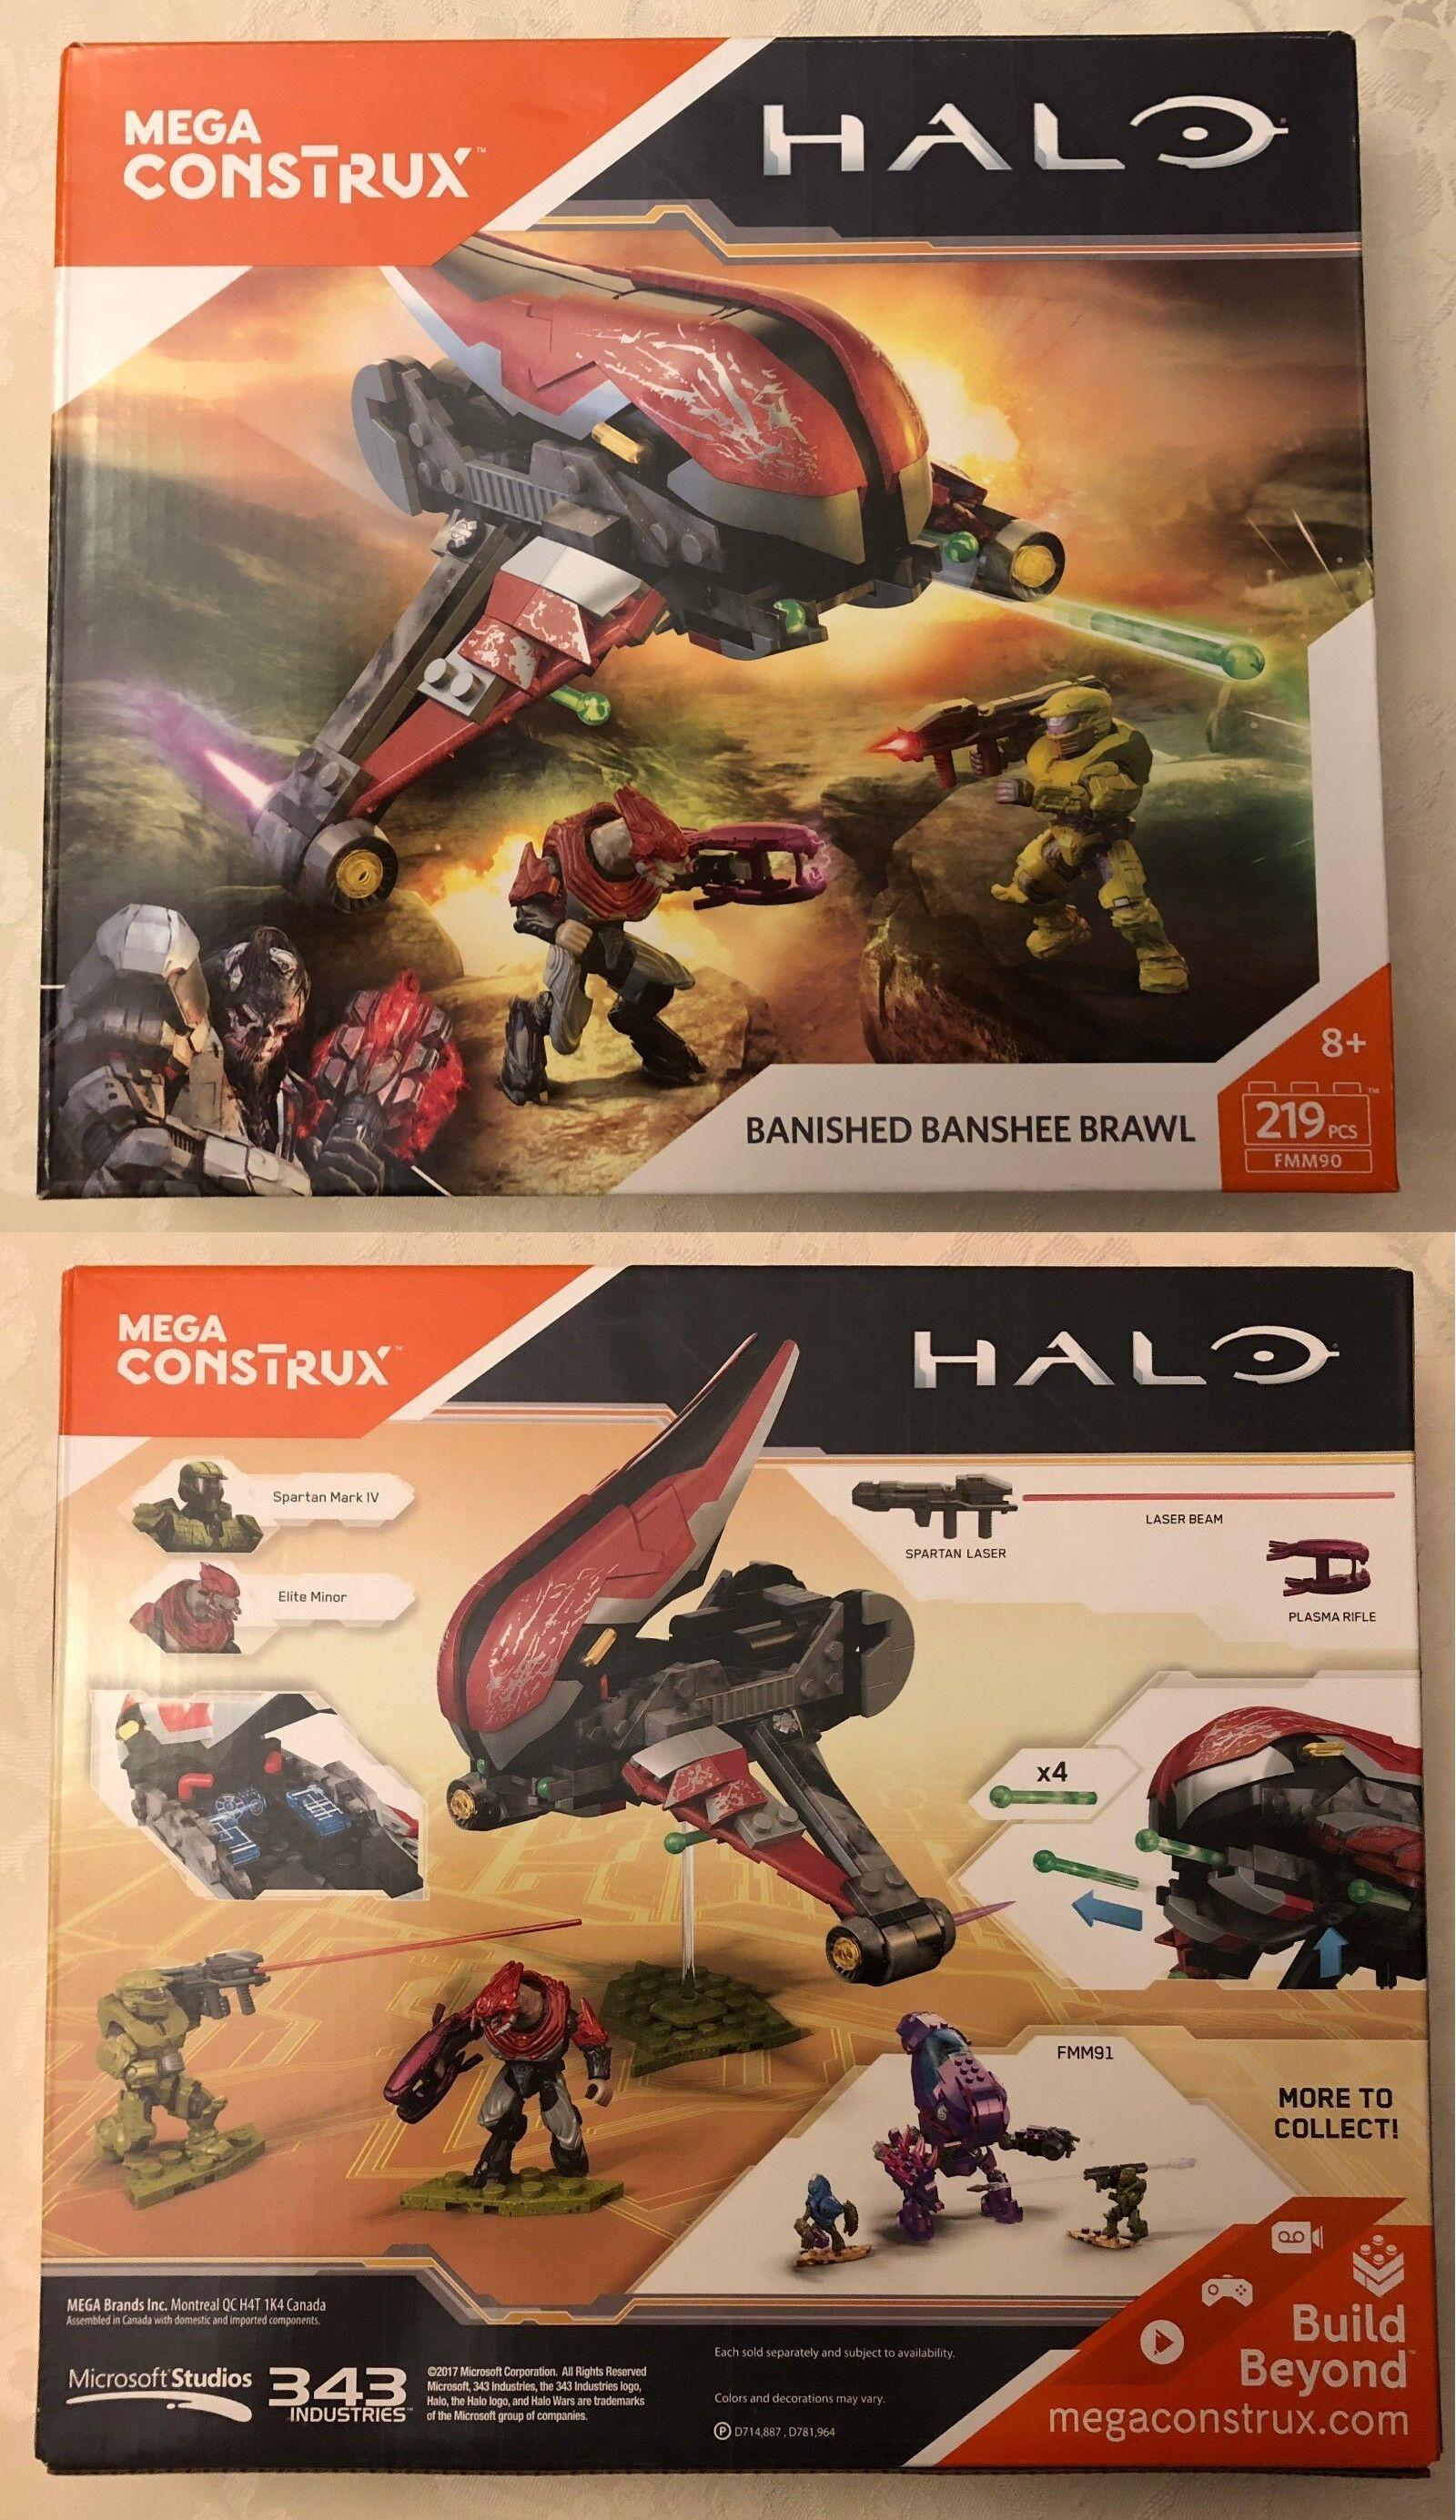 Mega Bloks Building Toys 52338: Mega Construx  Halo Banished